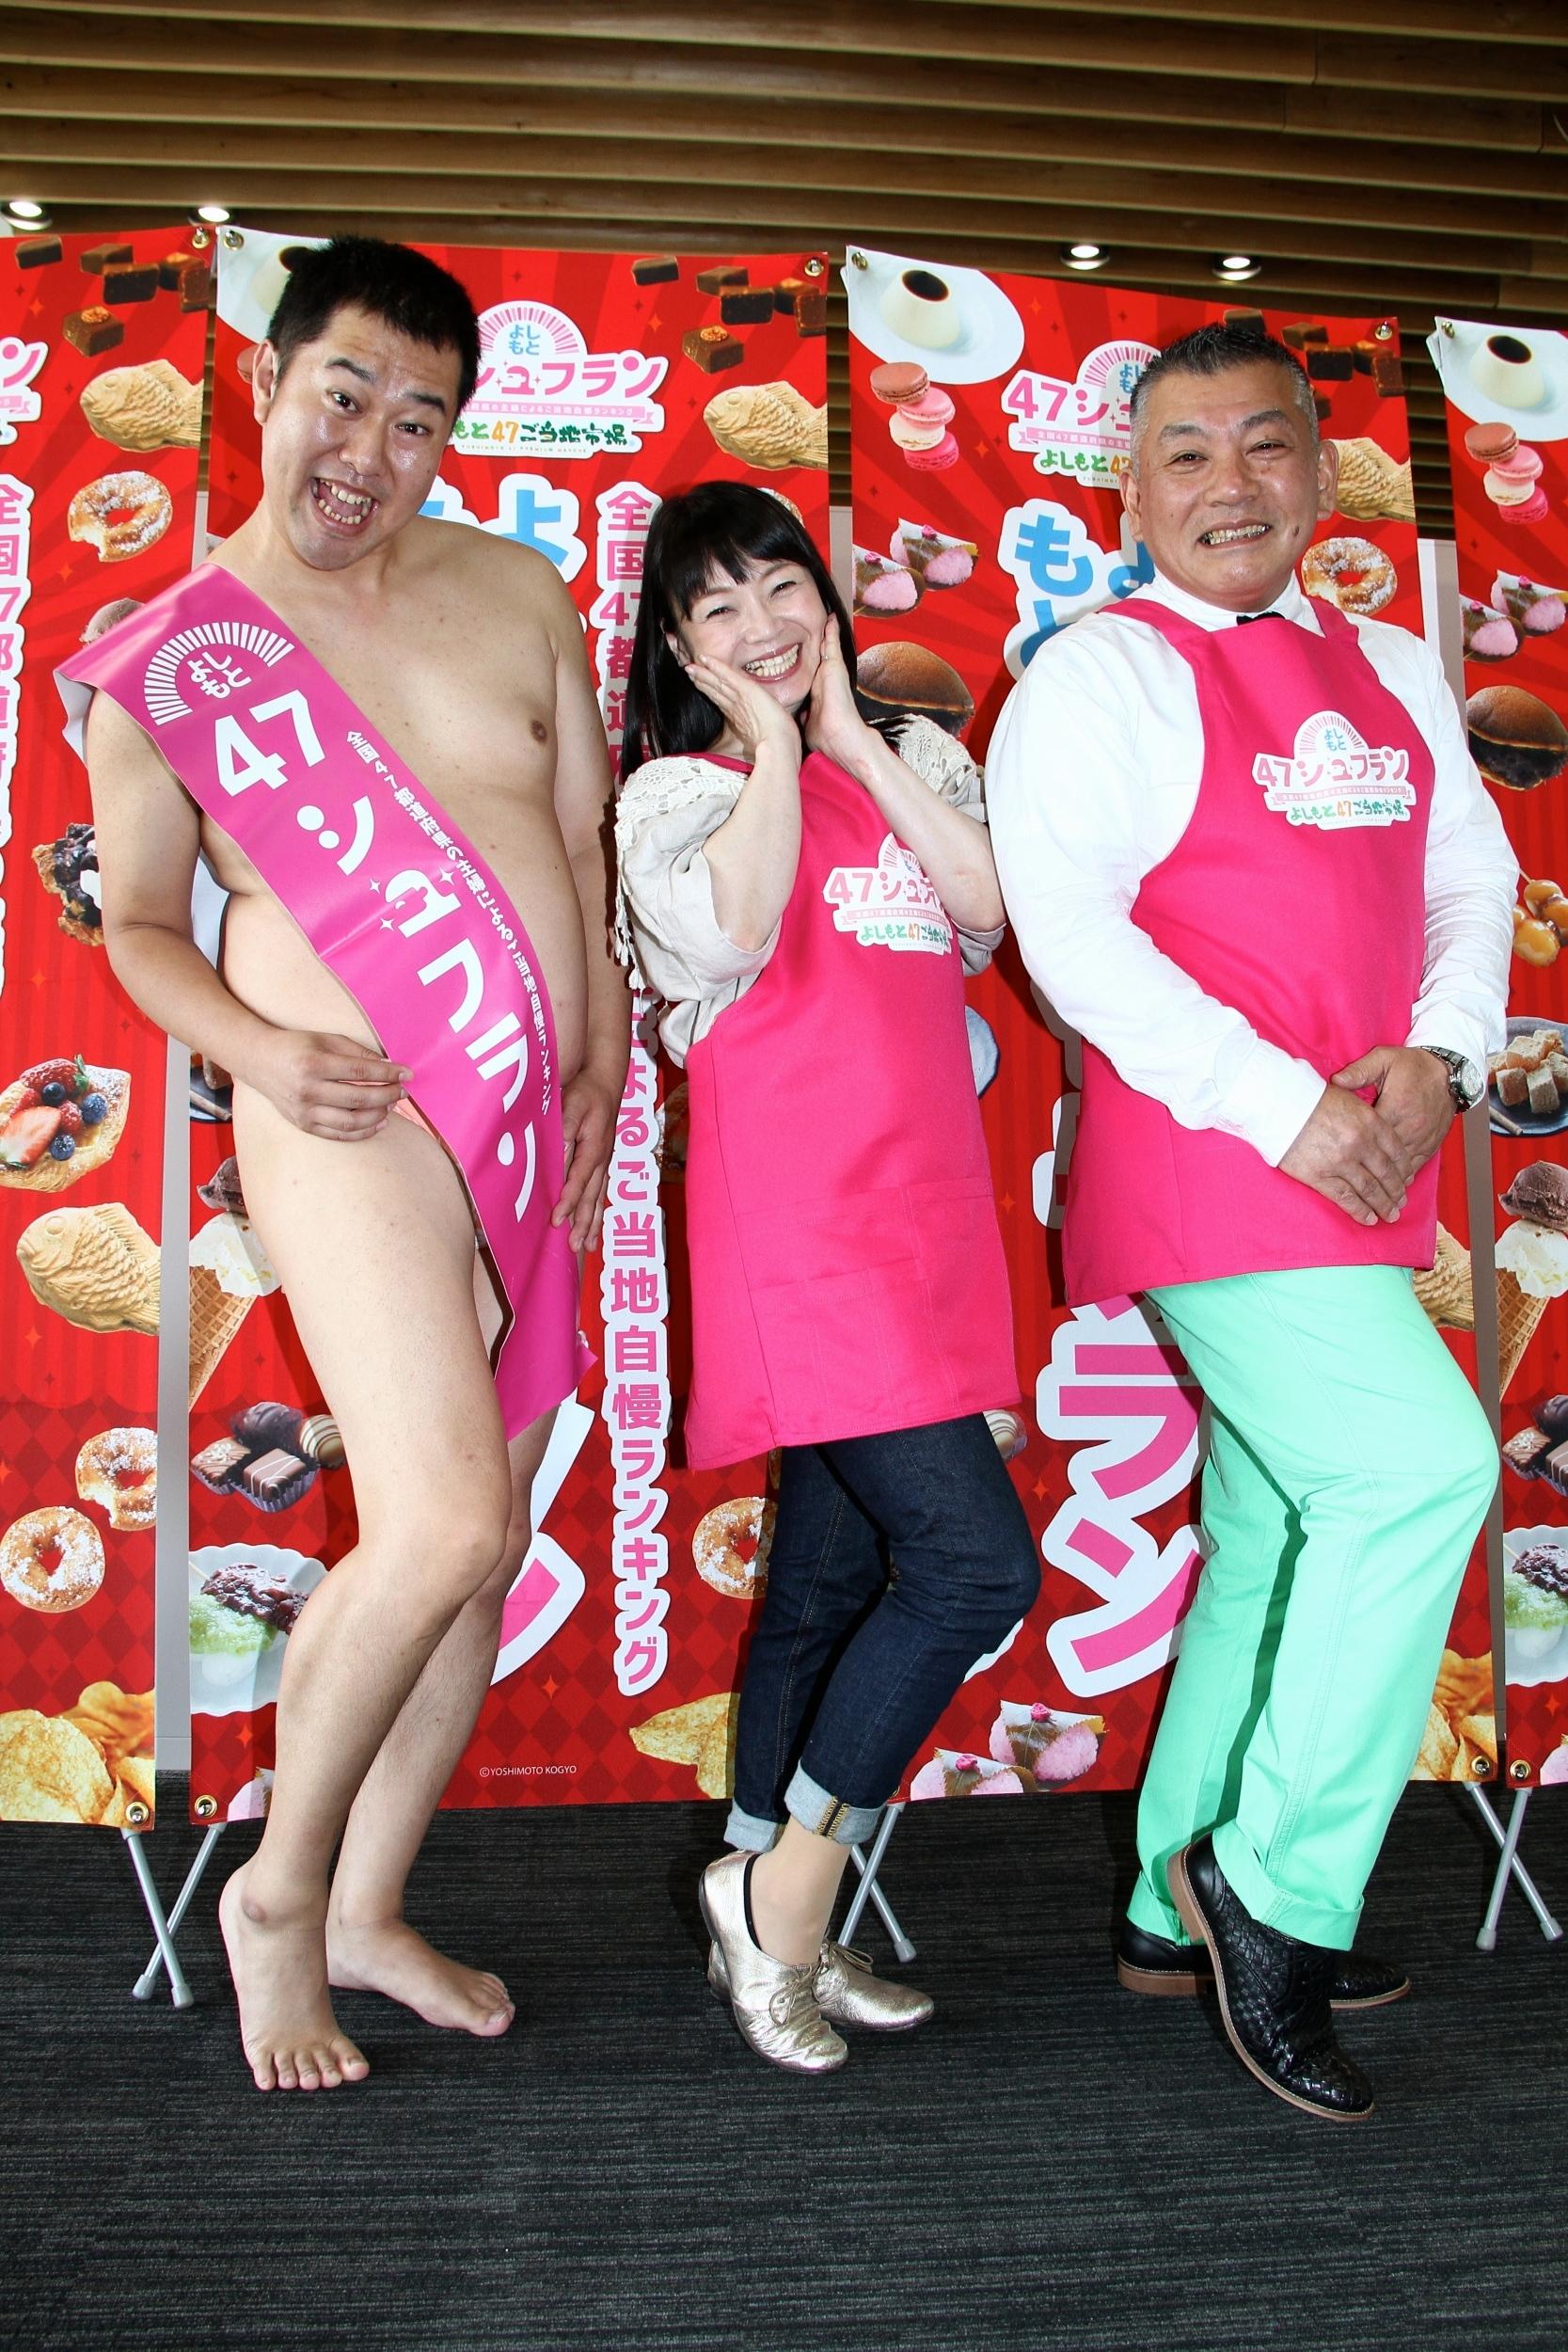 http://news.yoshimoto.co.jp/photos/uncategorized/2015/05/28/20150528172336-451f94f313aea8682cce425b19cb76231b802967.jpg